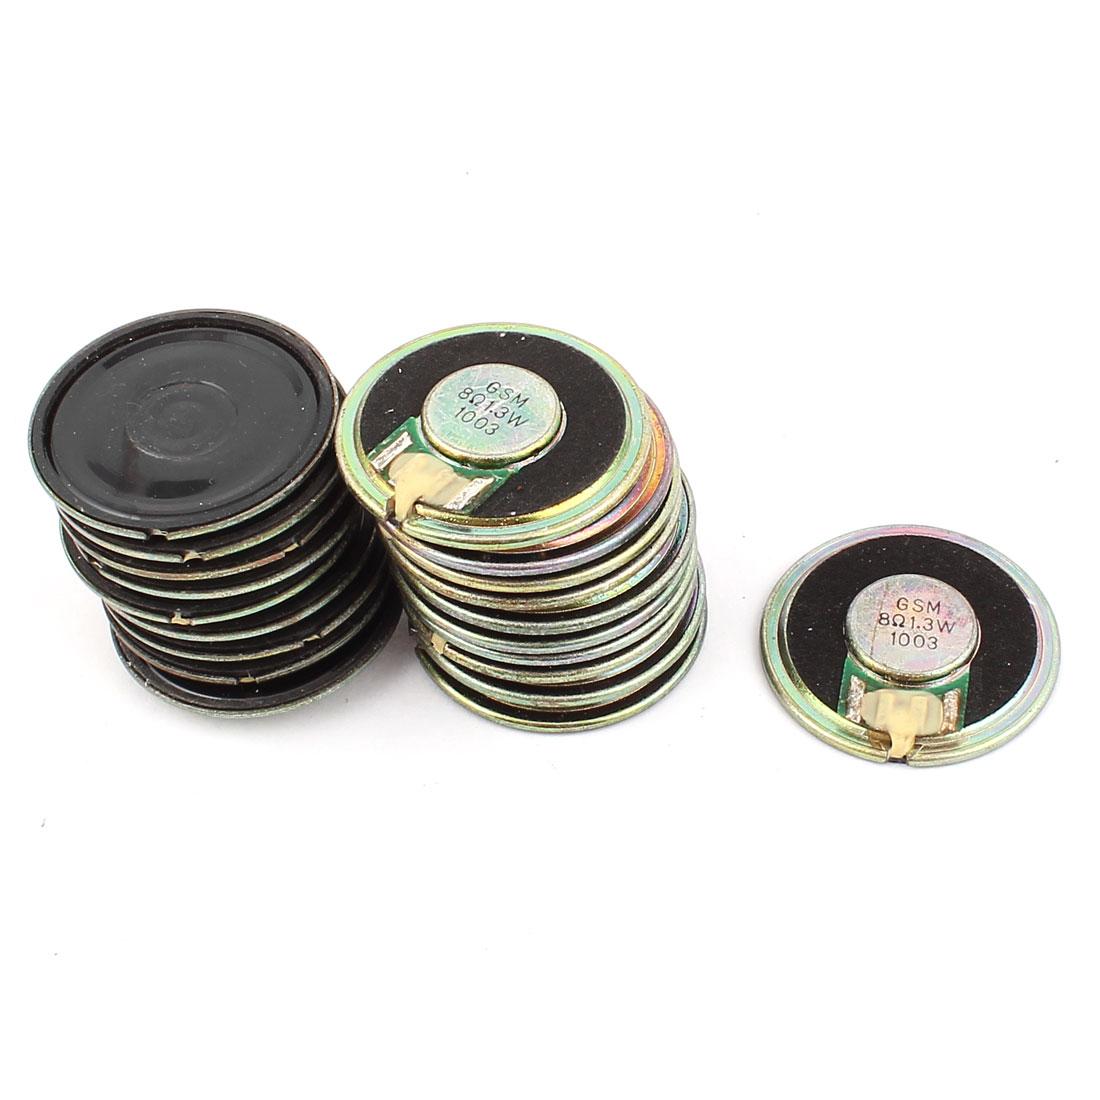 20 Pcs 36mm 8 Ohm 1.3W Metal Shell External Magnetic Speaker Loudspeaker Gold Tone